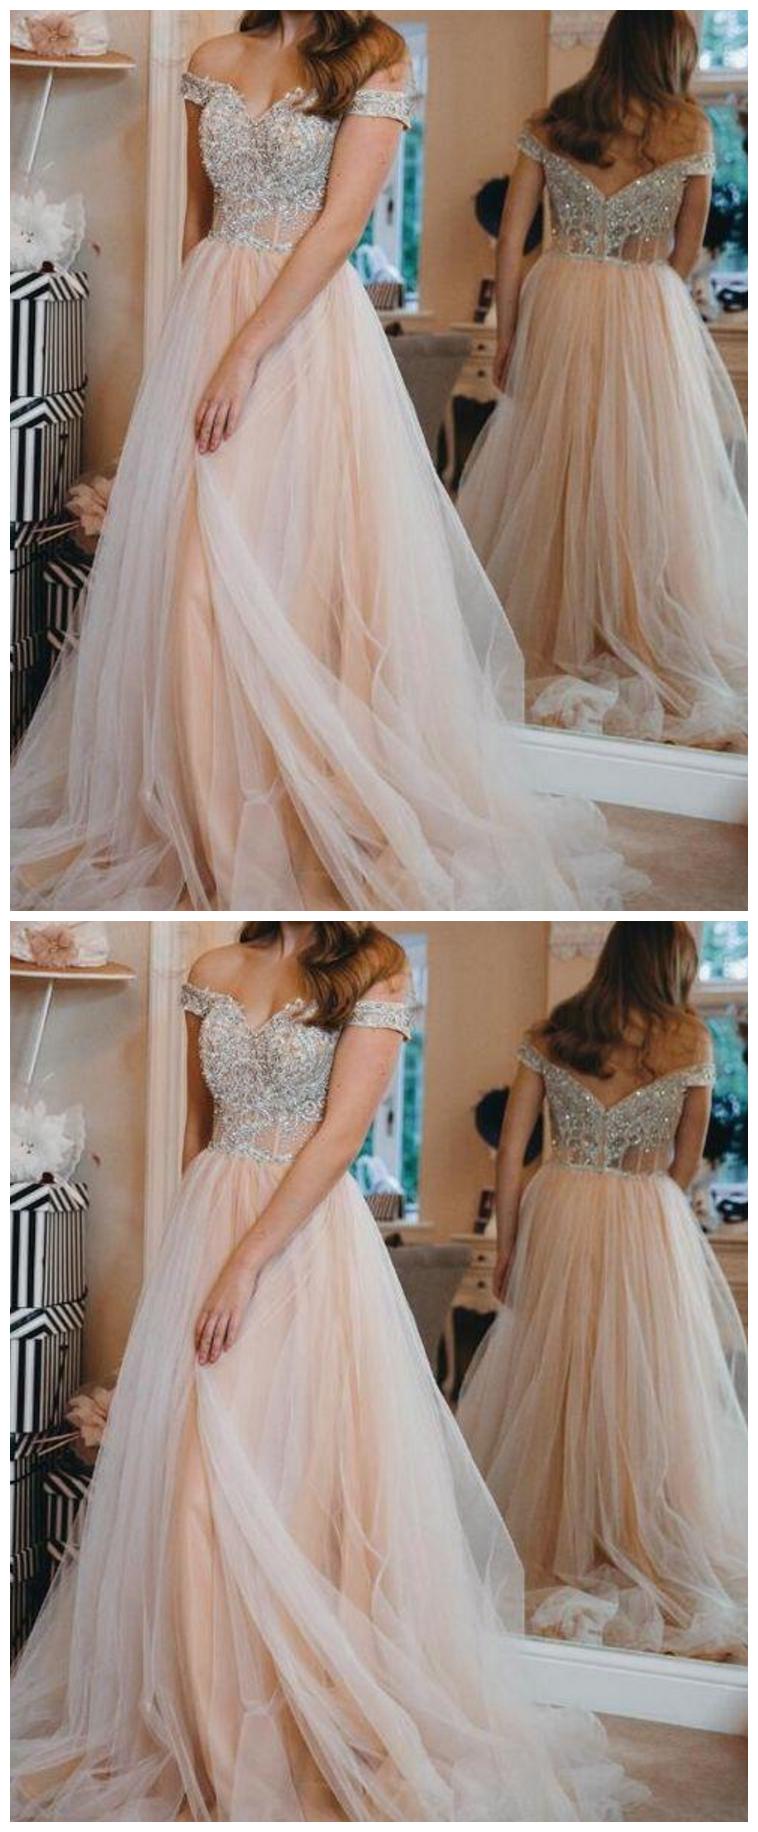 Off Shoulder Prom Dress Sparkly Beaded Evening Gowns Fashion Long Tulle School Dance Dress #schooldancedresses